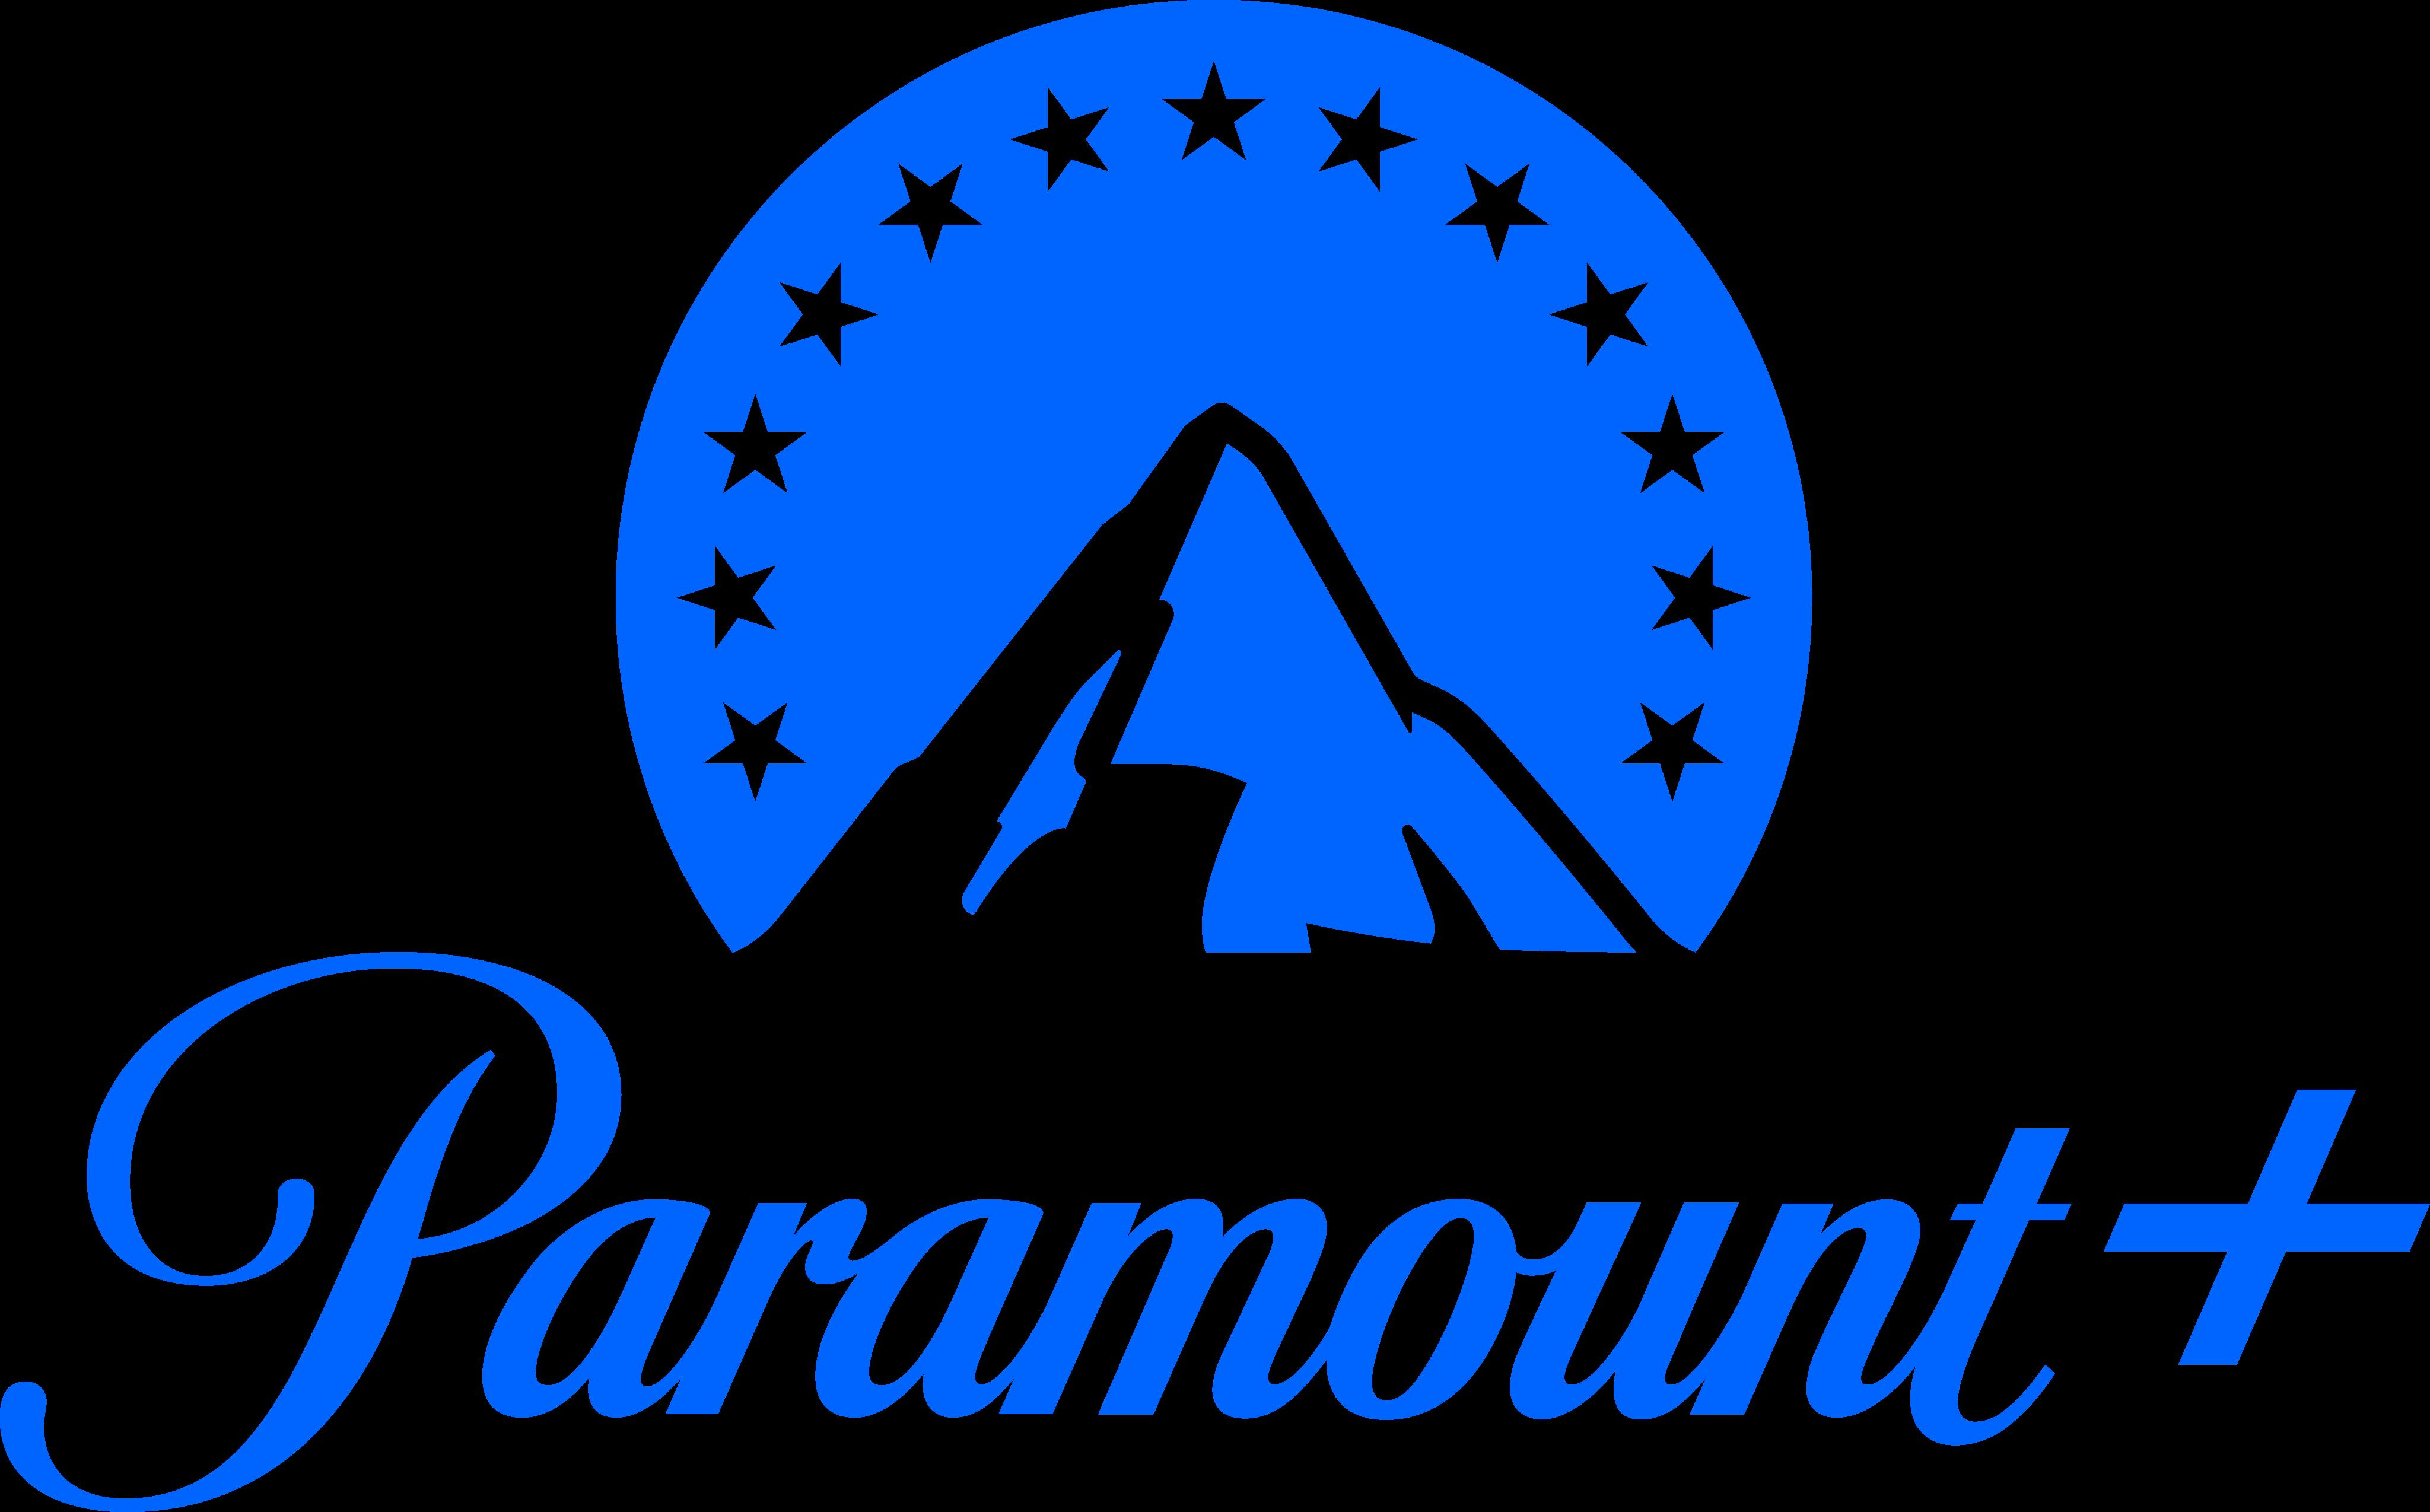 paramount plus logo 1 - Paramount+ Logo